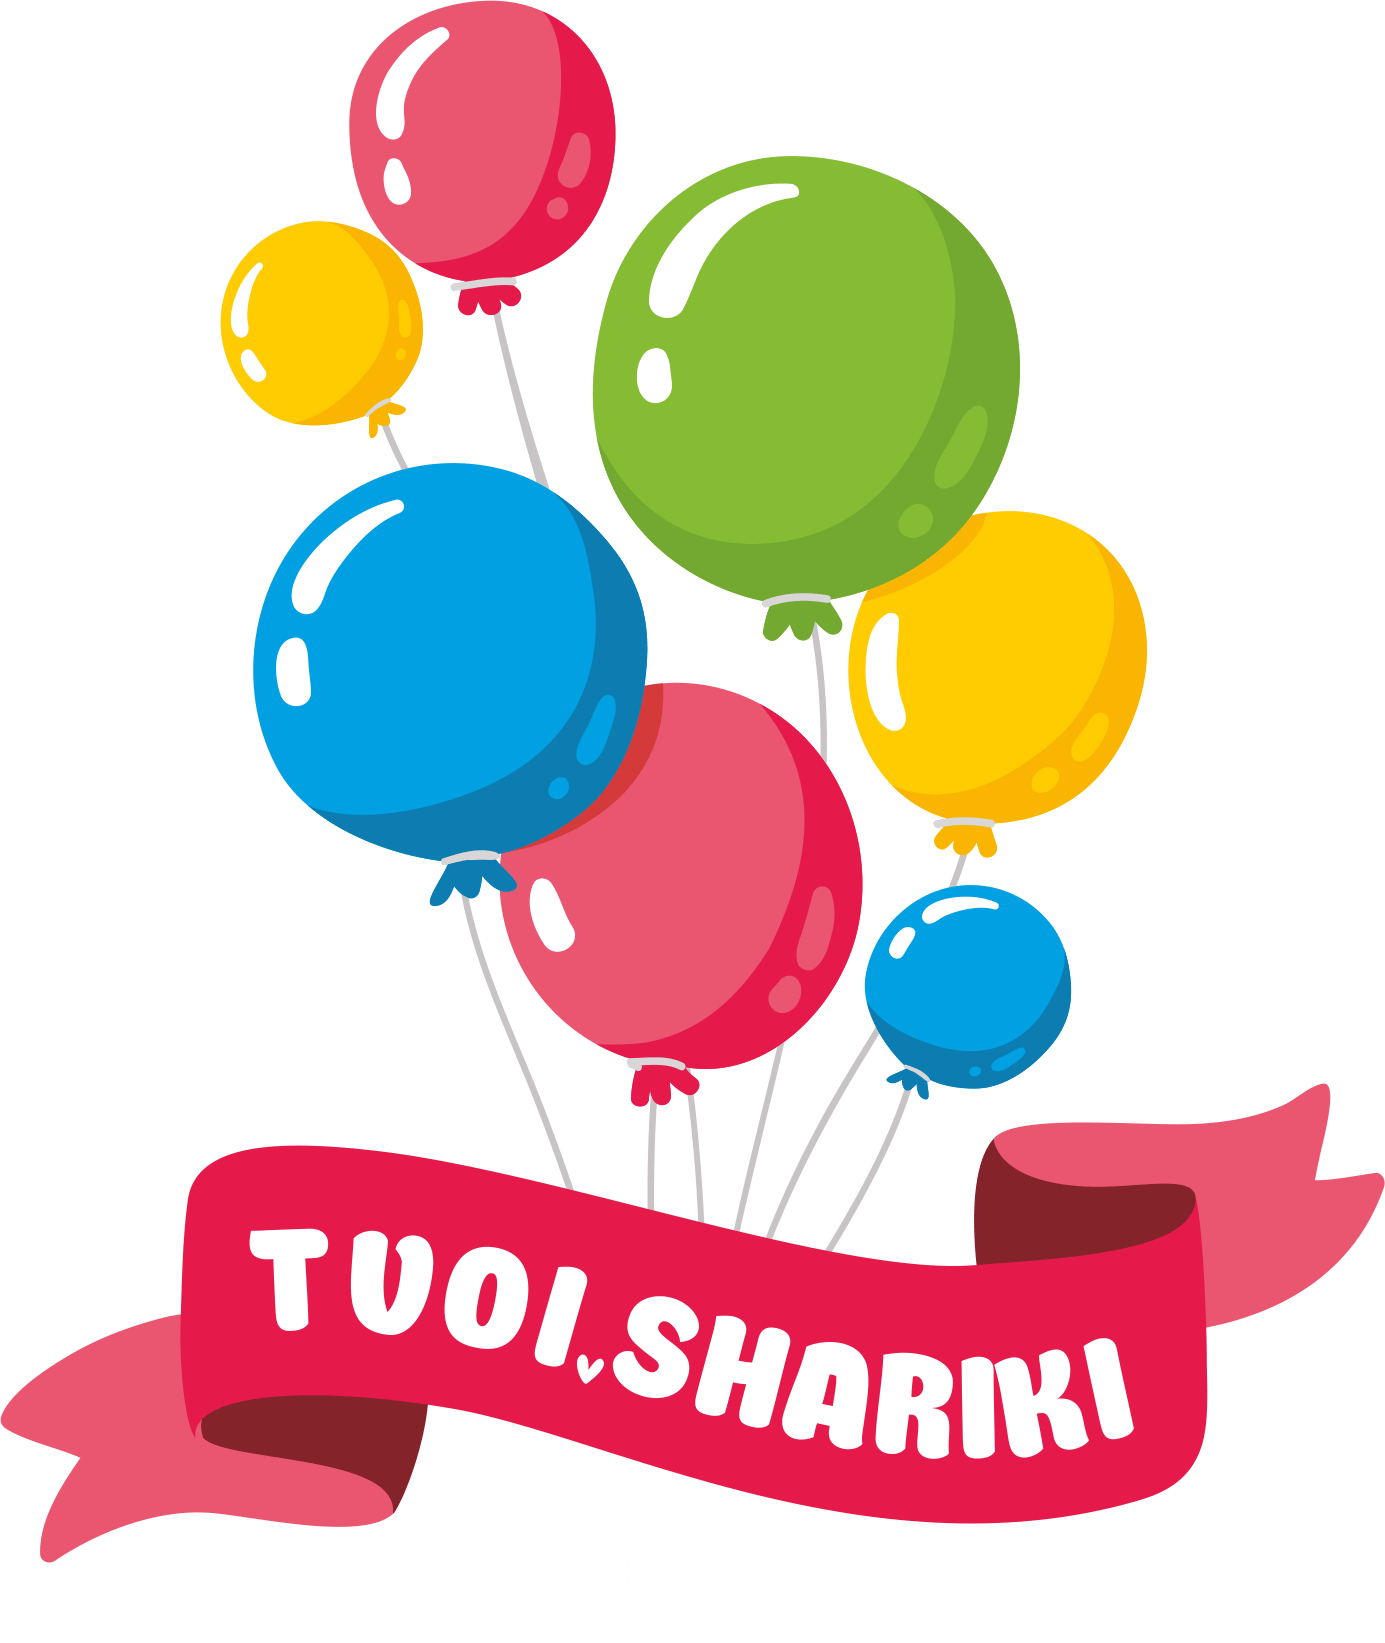 Логотип TVOI.SHARIKI - гелиевые шарики Нижний Новгород